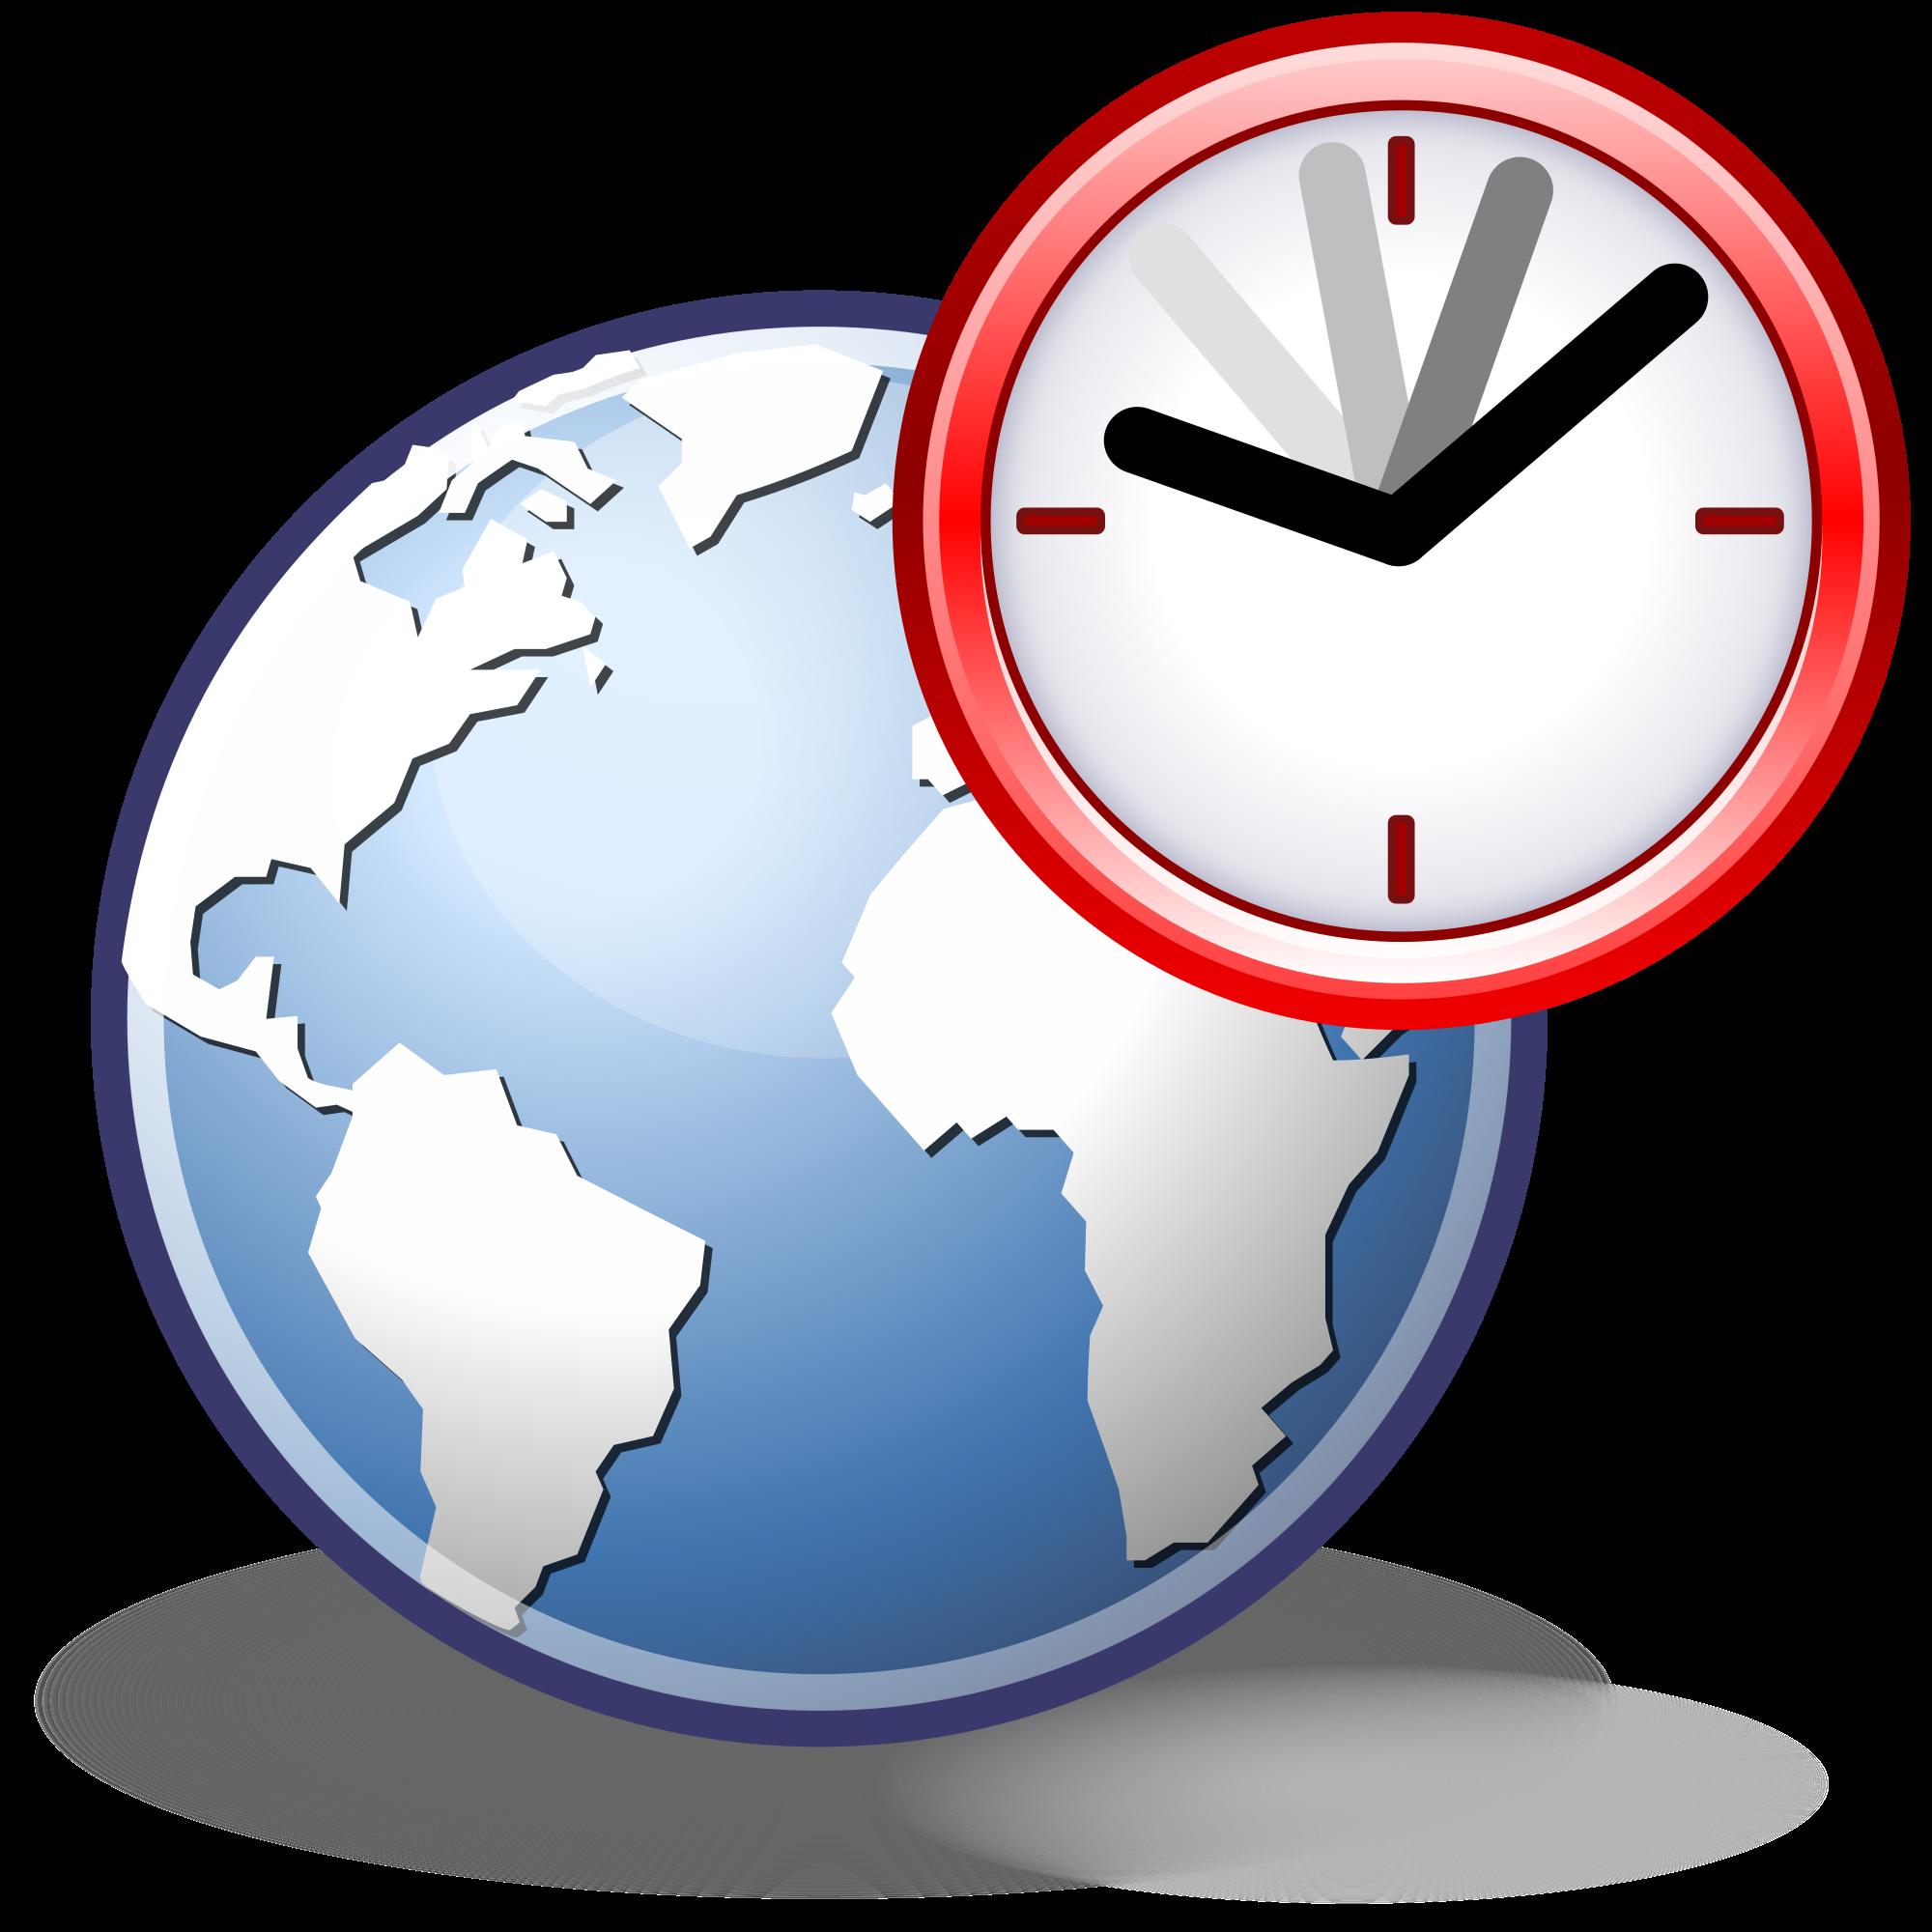 Clipart globe current event. File gnome svg wikimedia